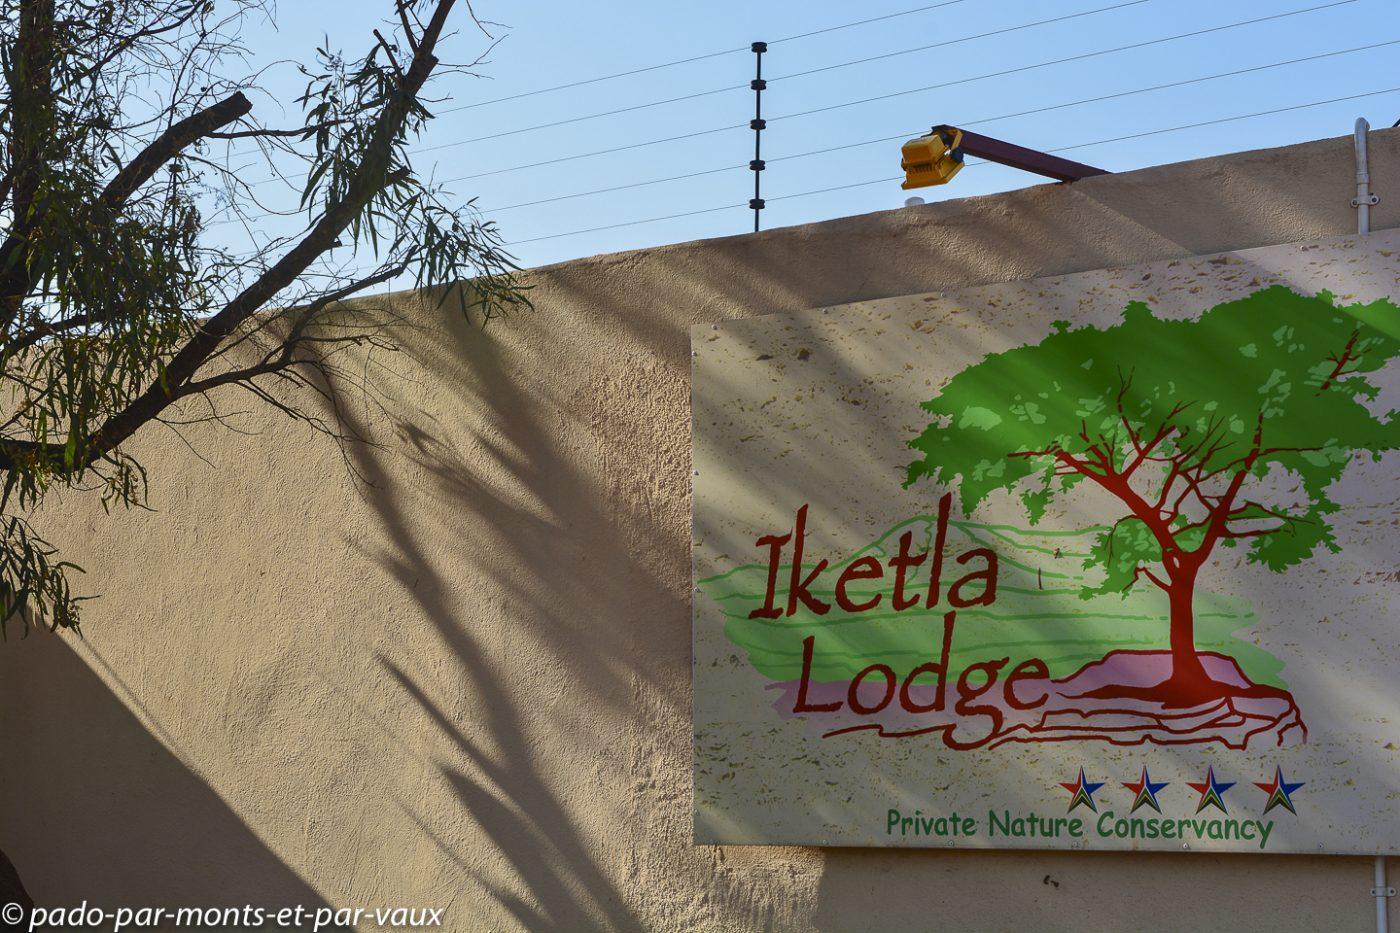 Mpumalanga- Iketla lodge